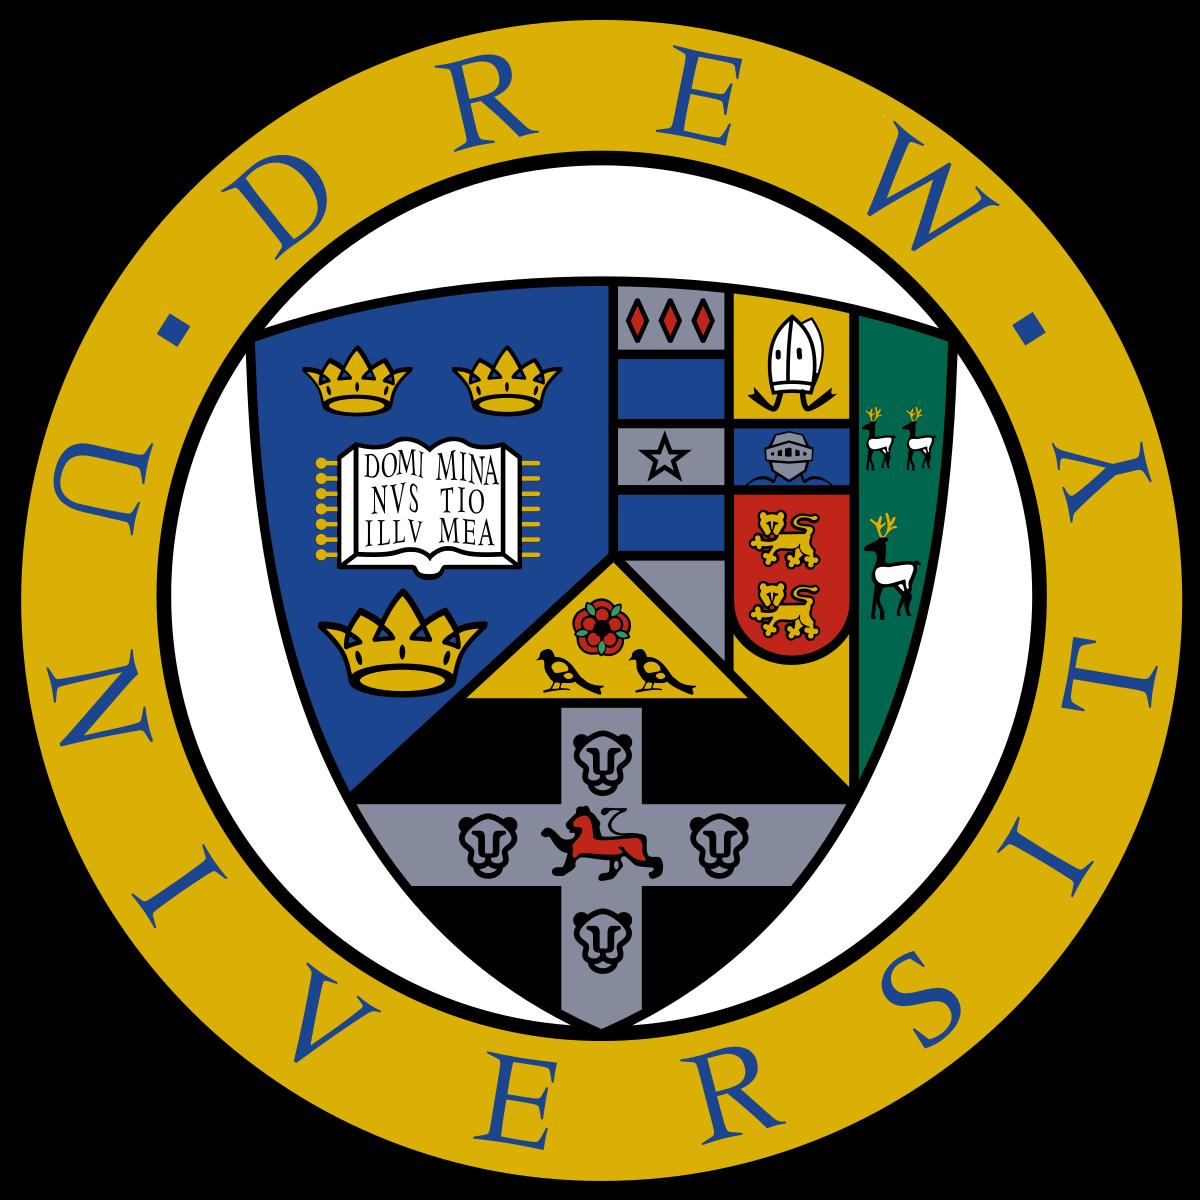 b24e8552f37518bee1c4_Drew_University_logo.jpg